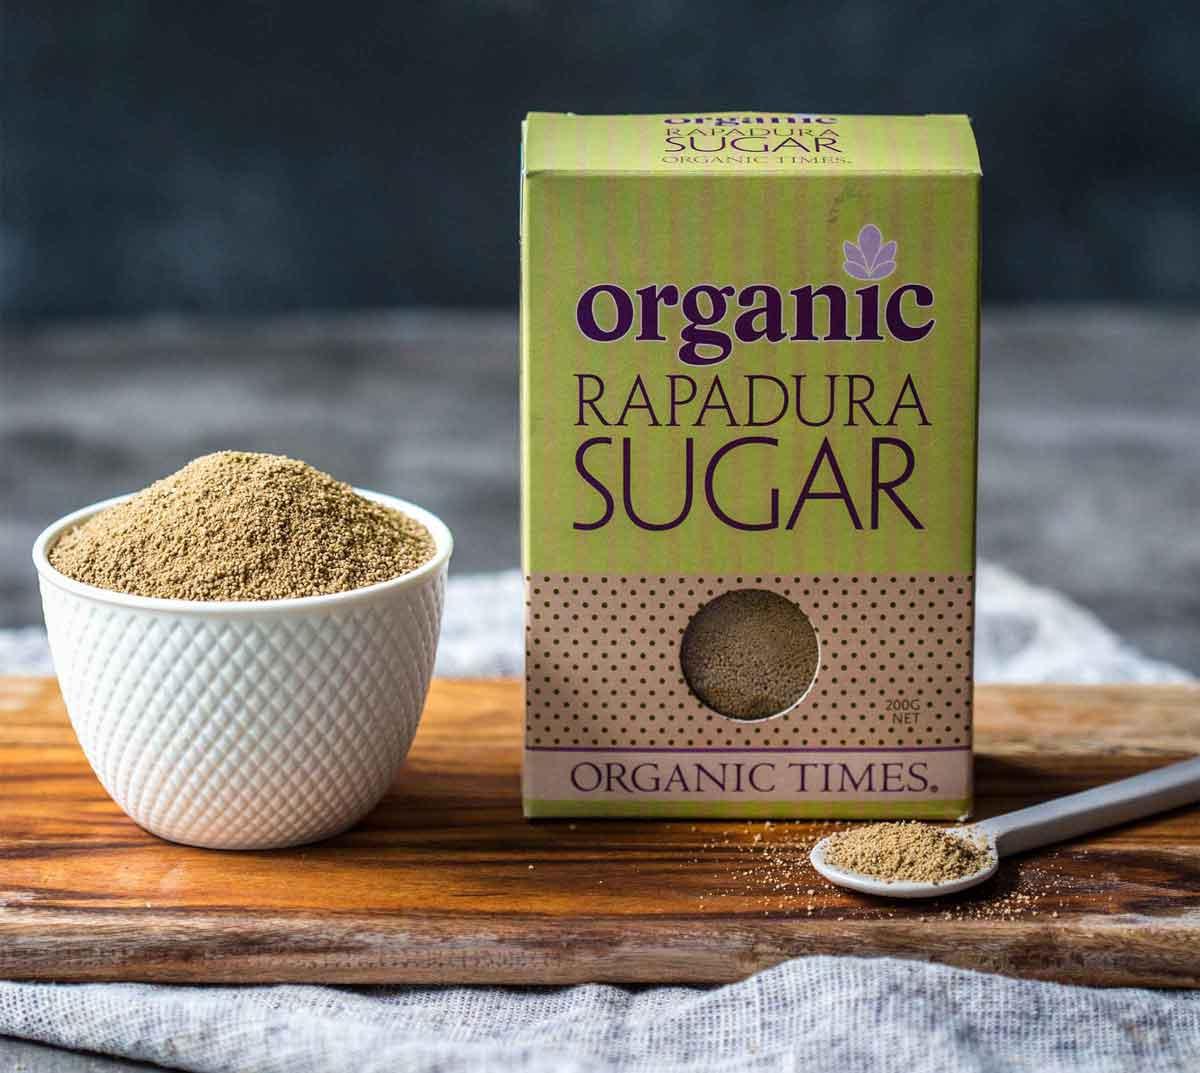 A bowl and box of Organic Times Rapadura Sugar